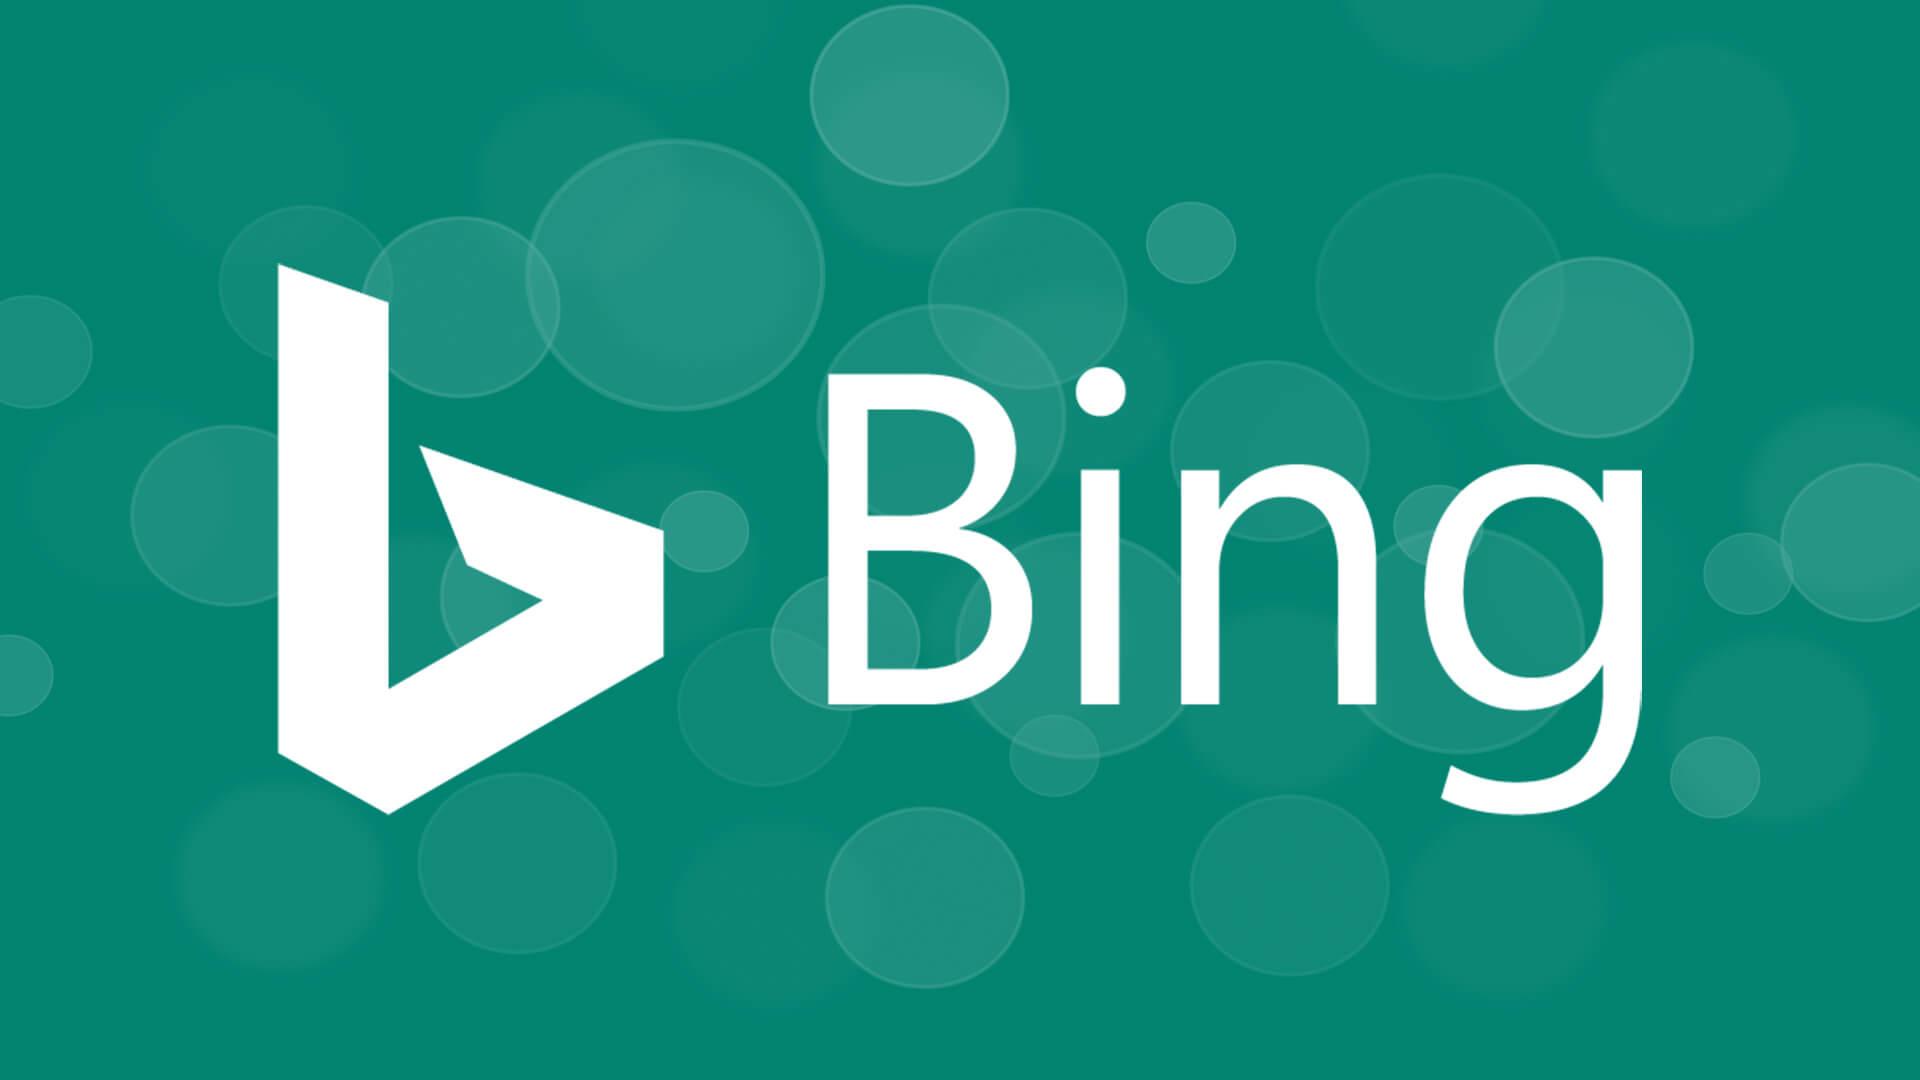 bing-teal-logo-wordmark5-1920